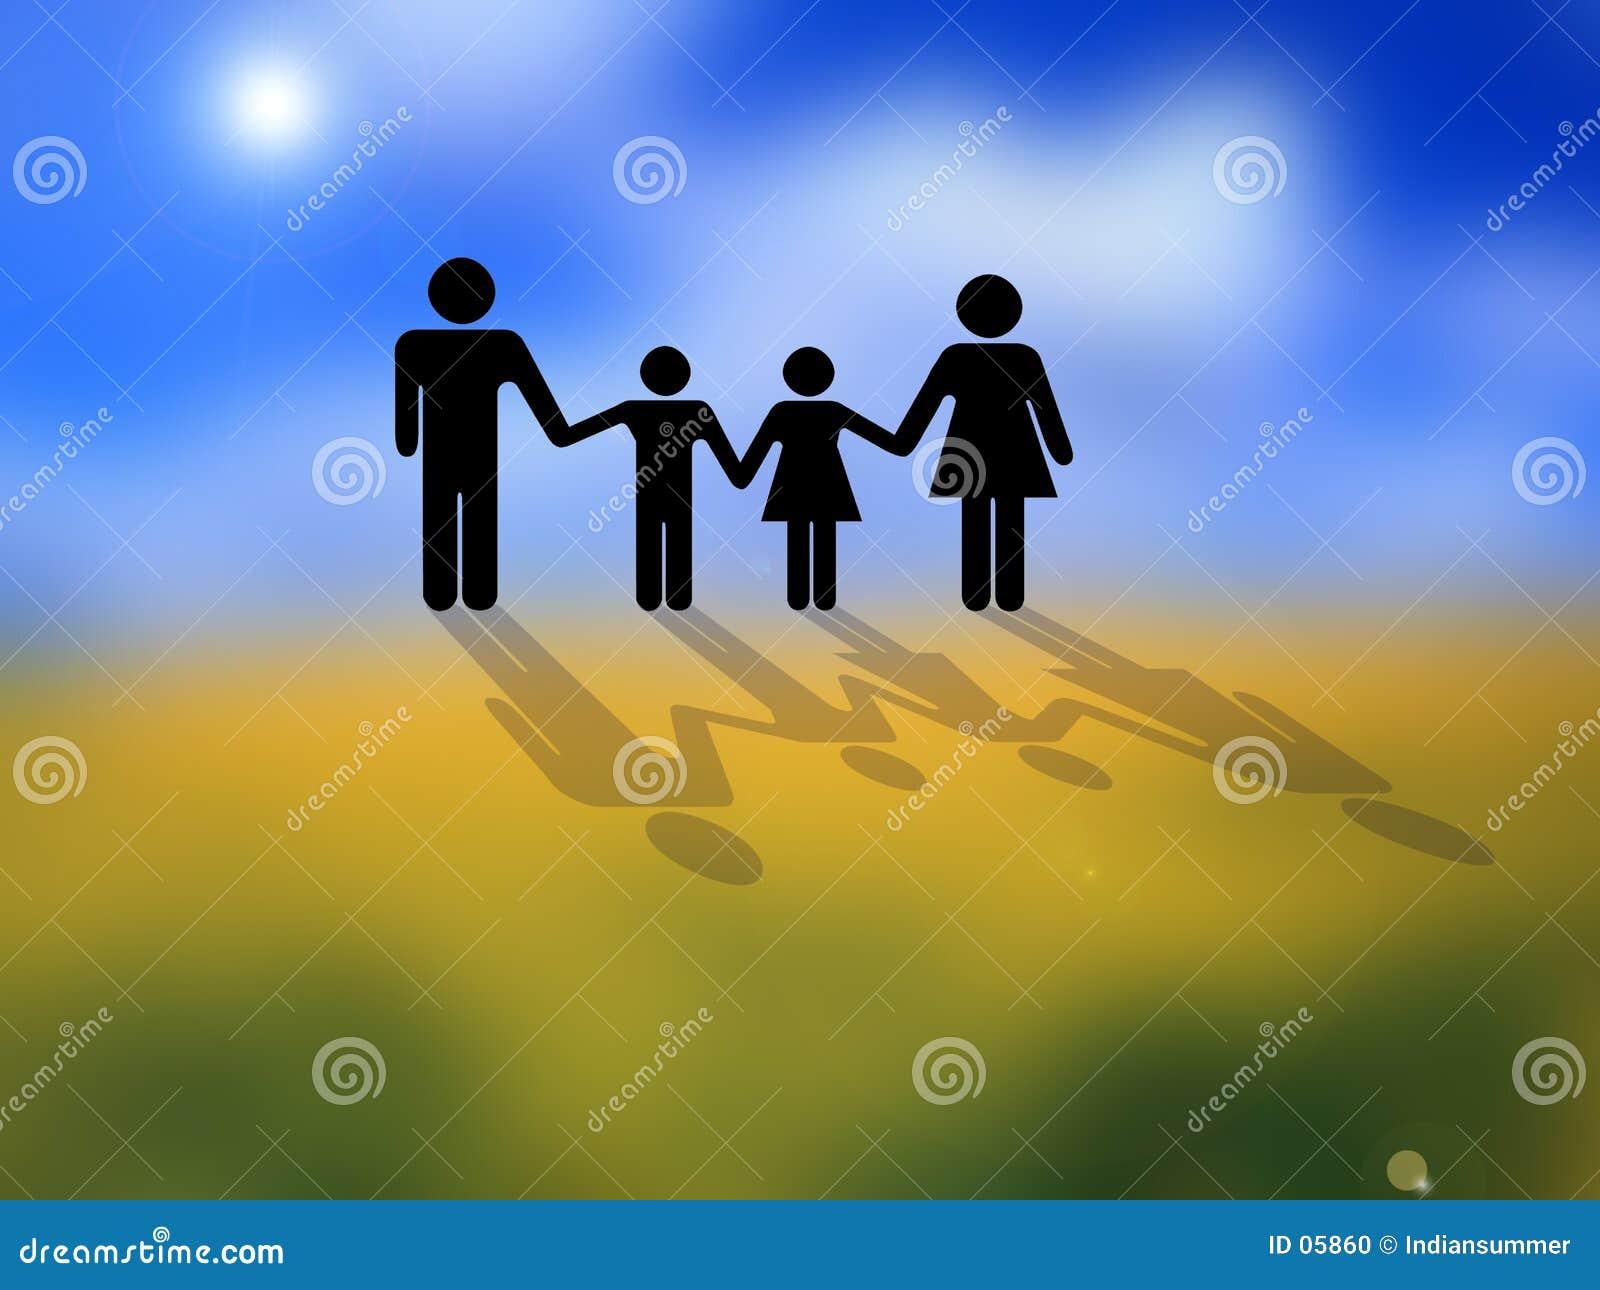 Conceptual family image